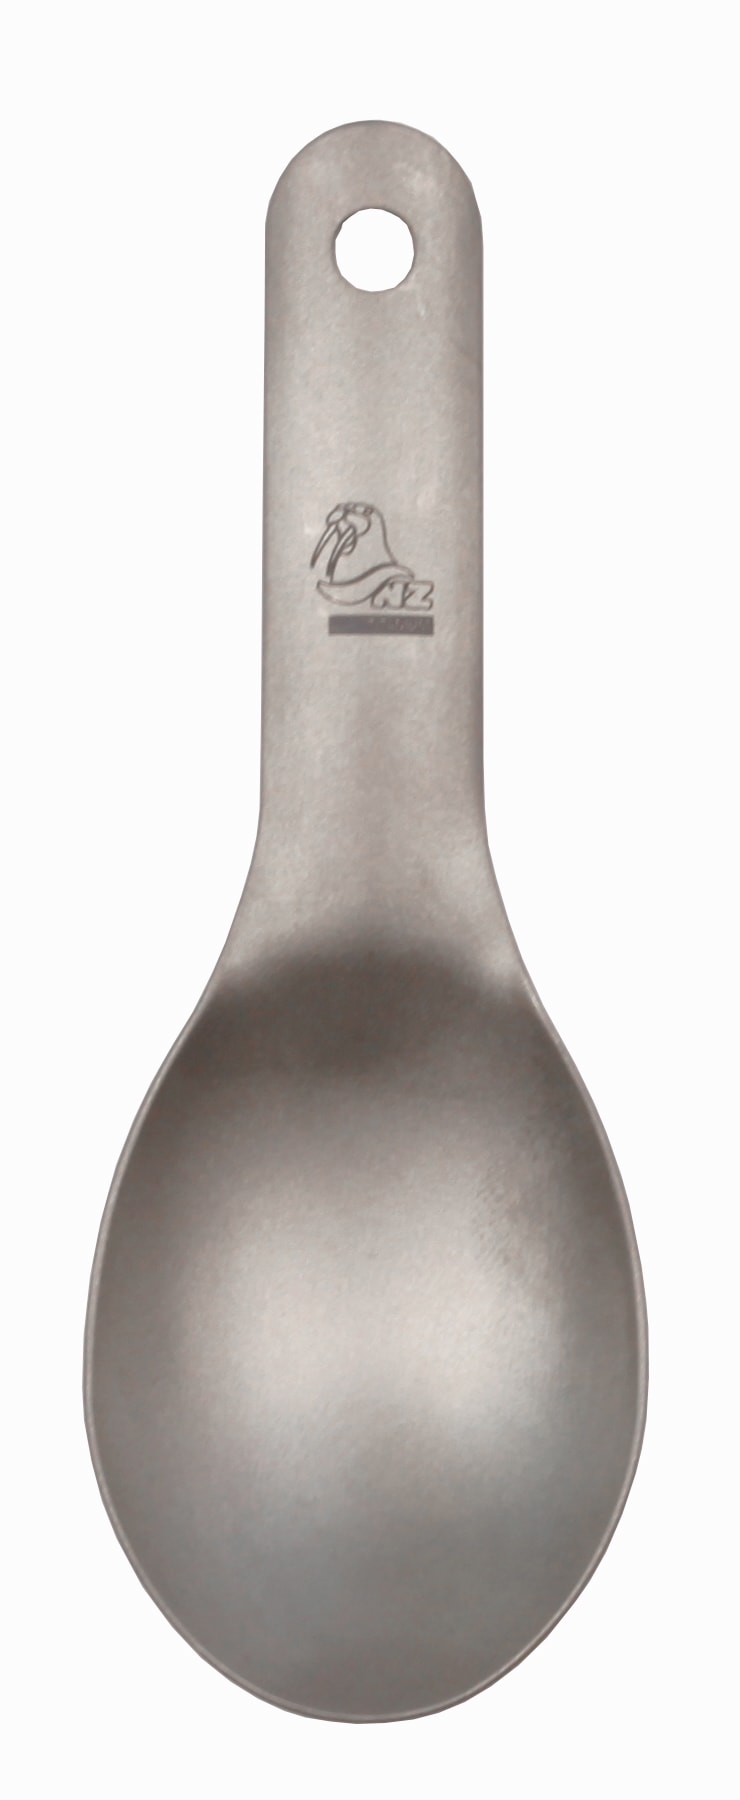 Мини-ложка NZ Ti Mini Spoon